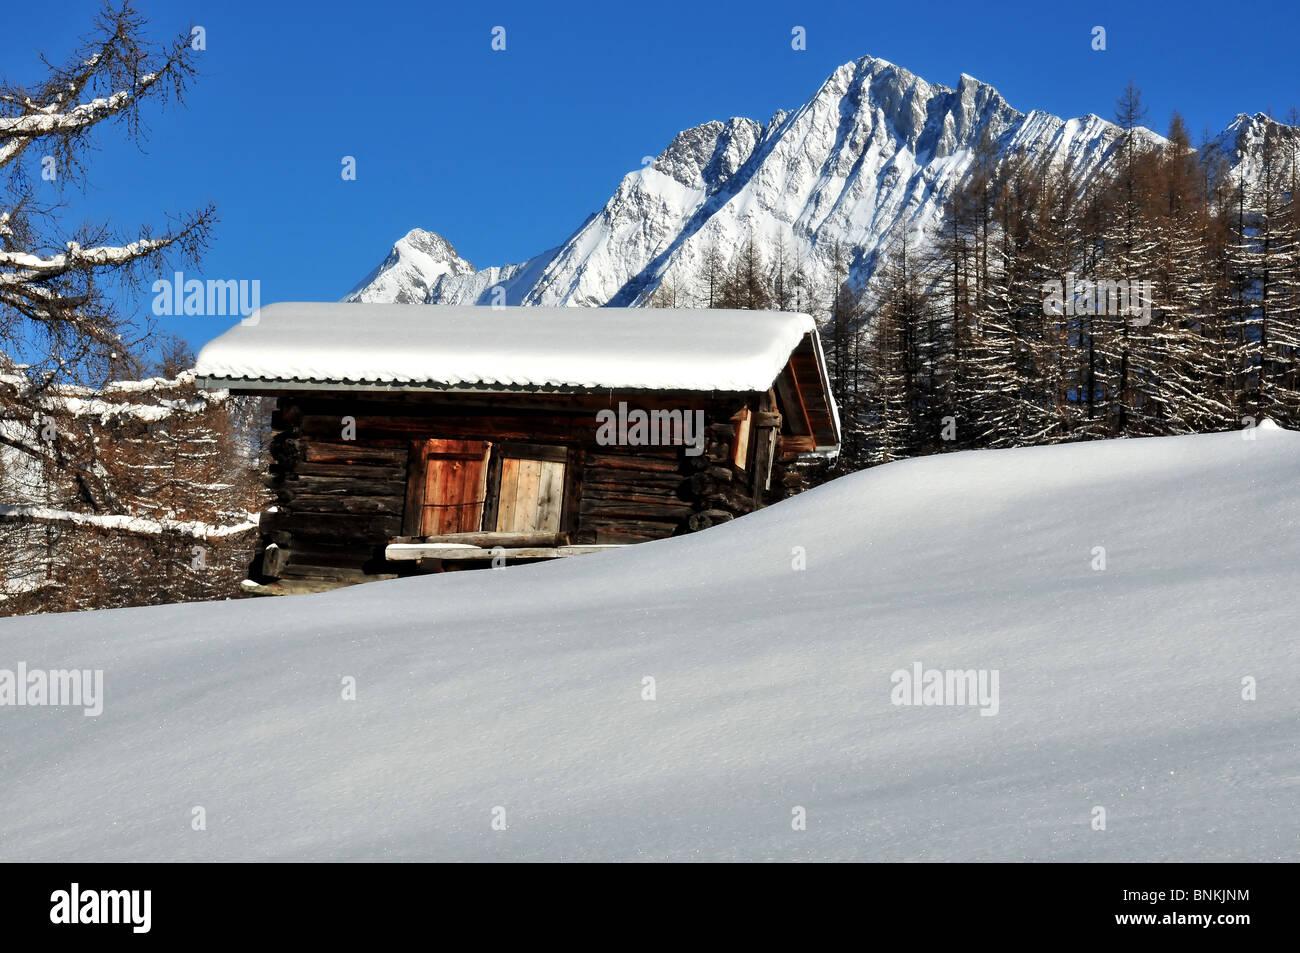 Switzerland Valais Blatter snow larch winter mountains Alps hut building construction glitter map card Swiss scenery - Stock Image